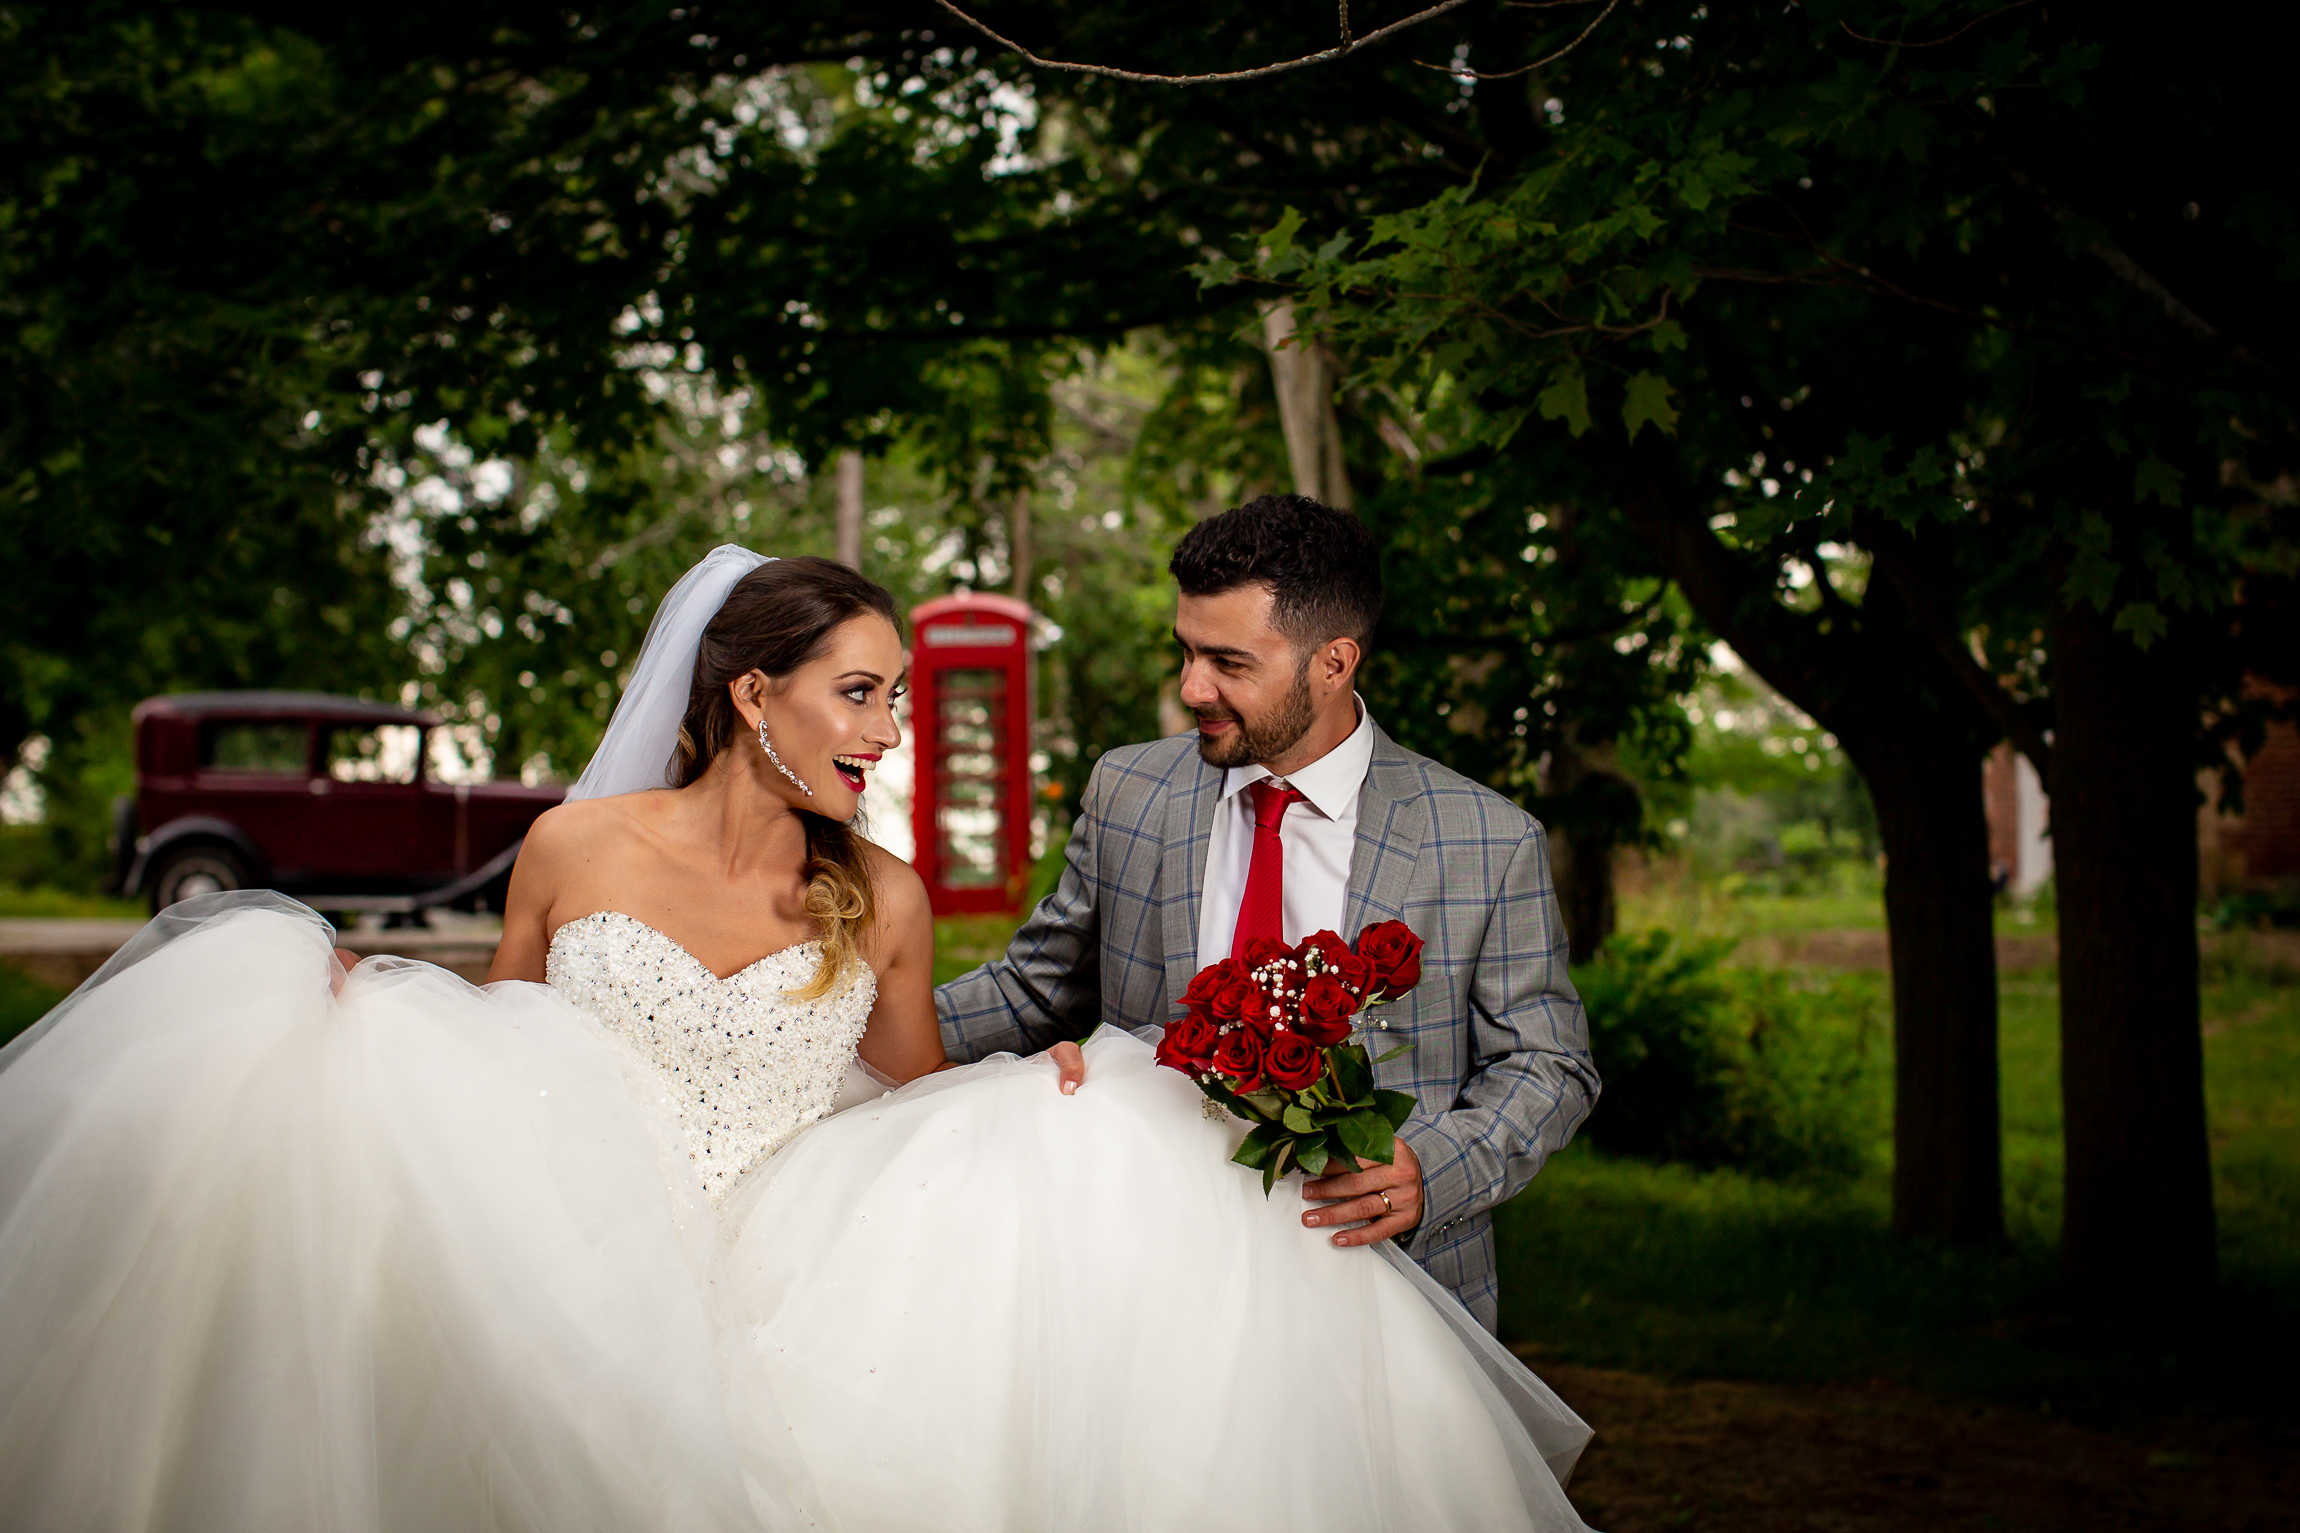 Toronto-wedding-Photograper-105.jpg